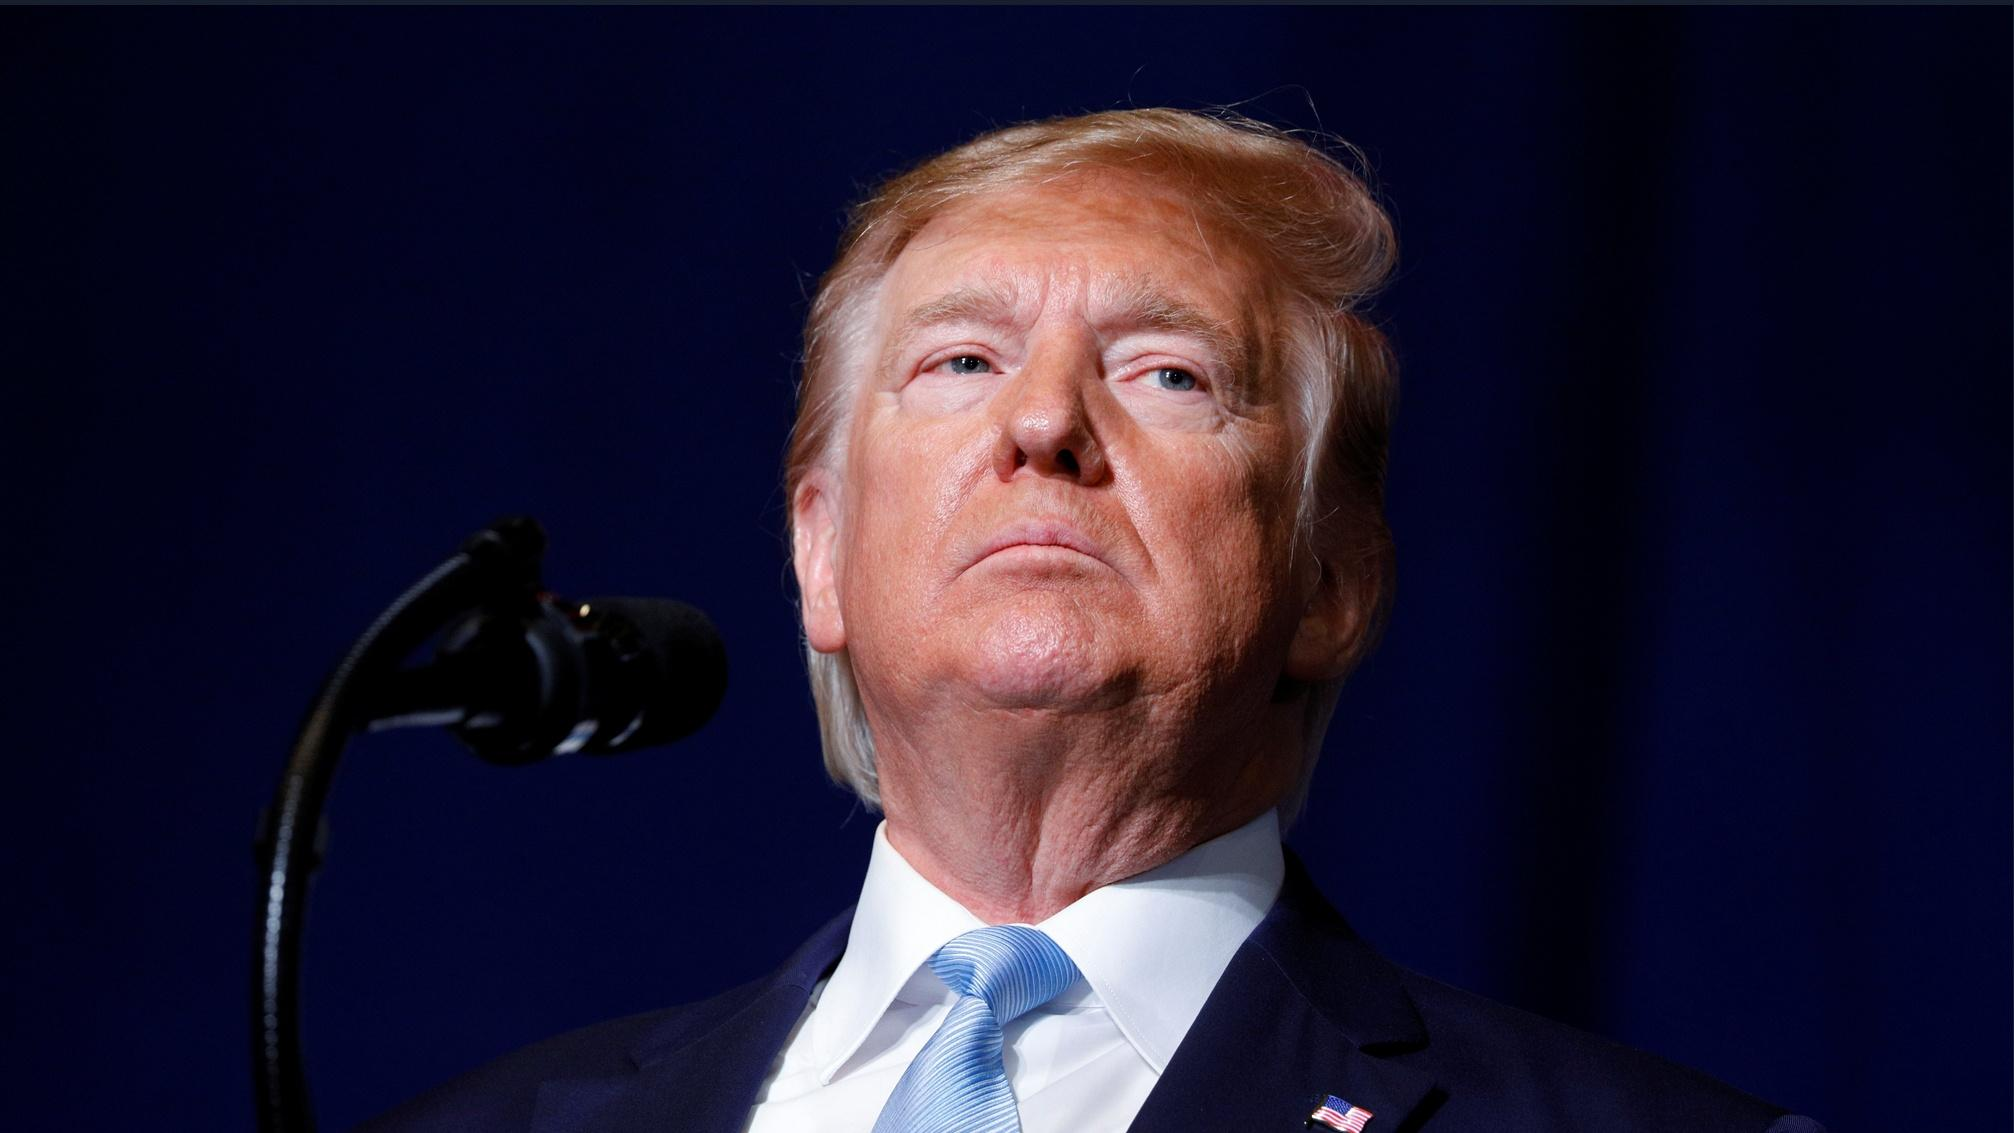 The Trump Impeachment Trial - Day 6